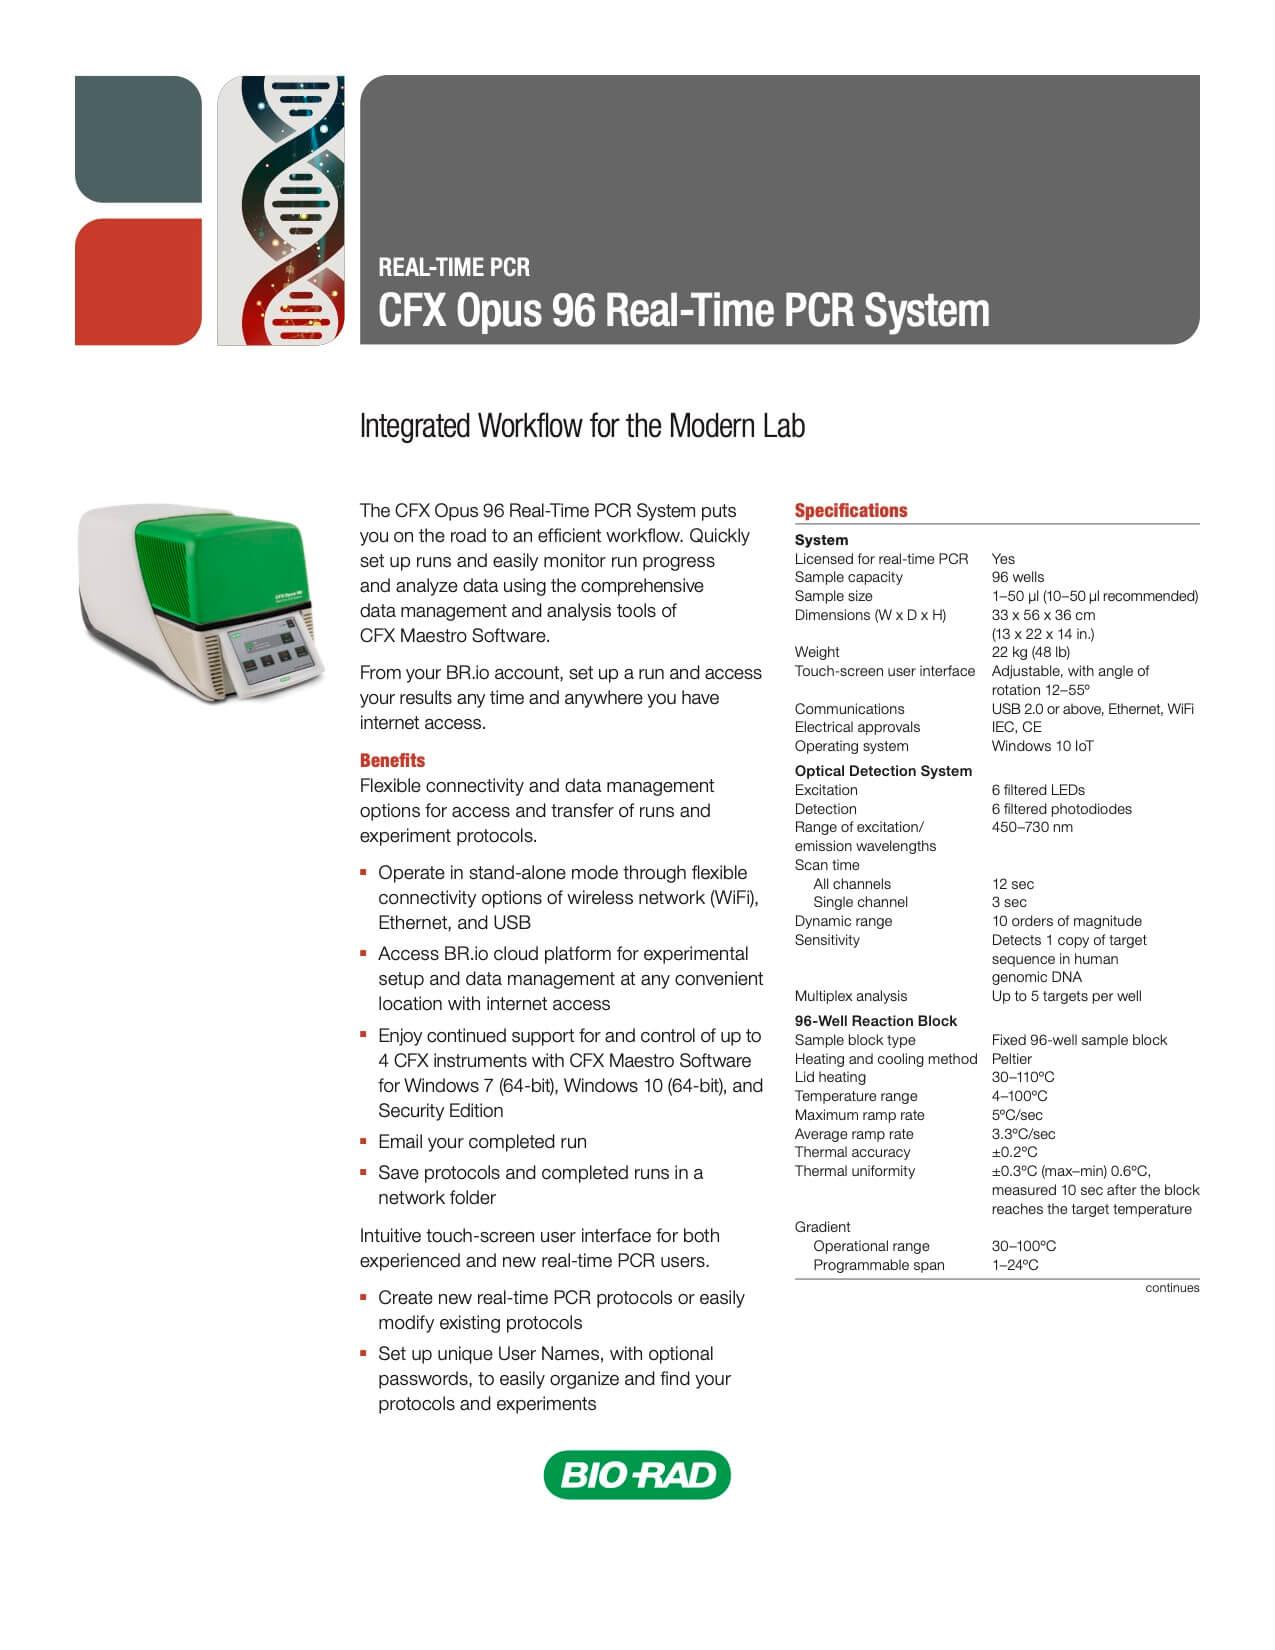 CFX Opus 96 – Real Time PCR